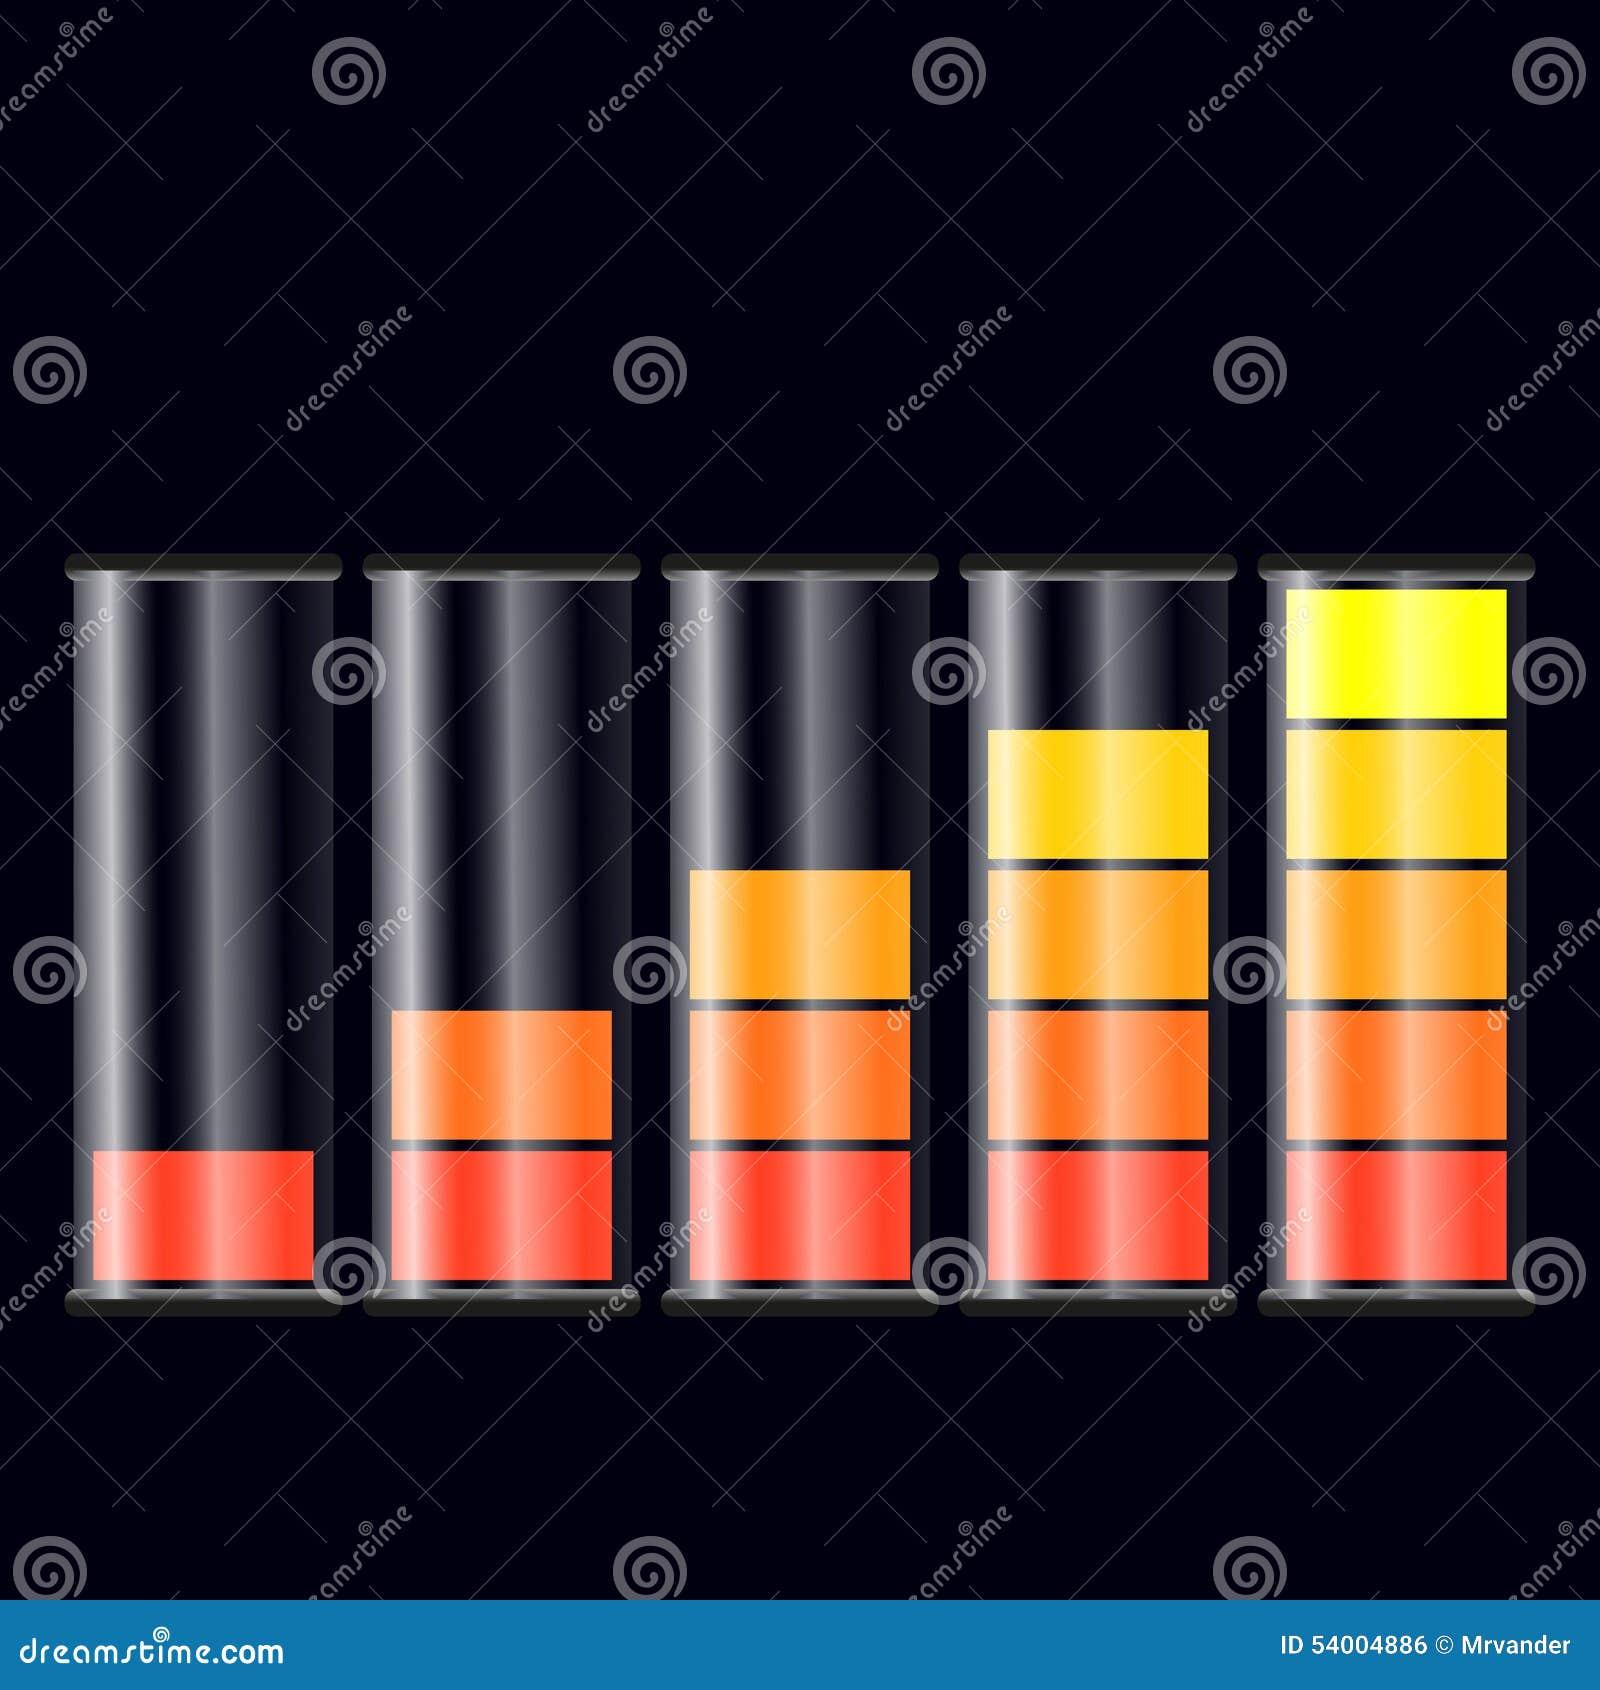 Windows 8 1 Set Battery Charge Level : Set of battery charge level indicators stock vector